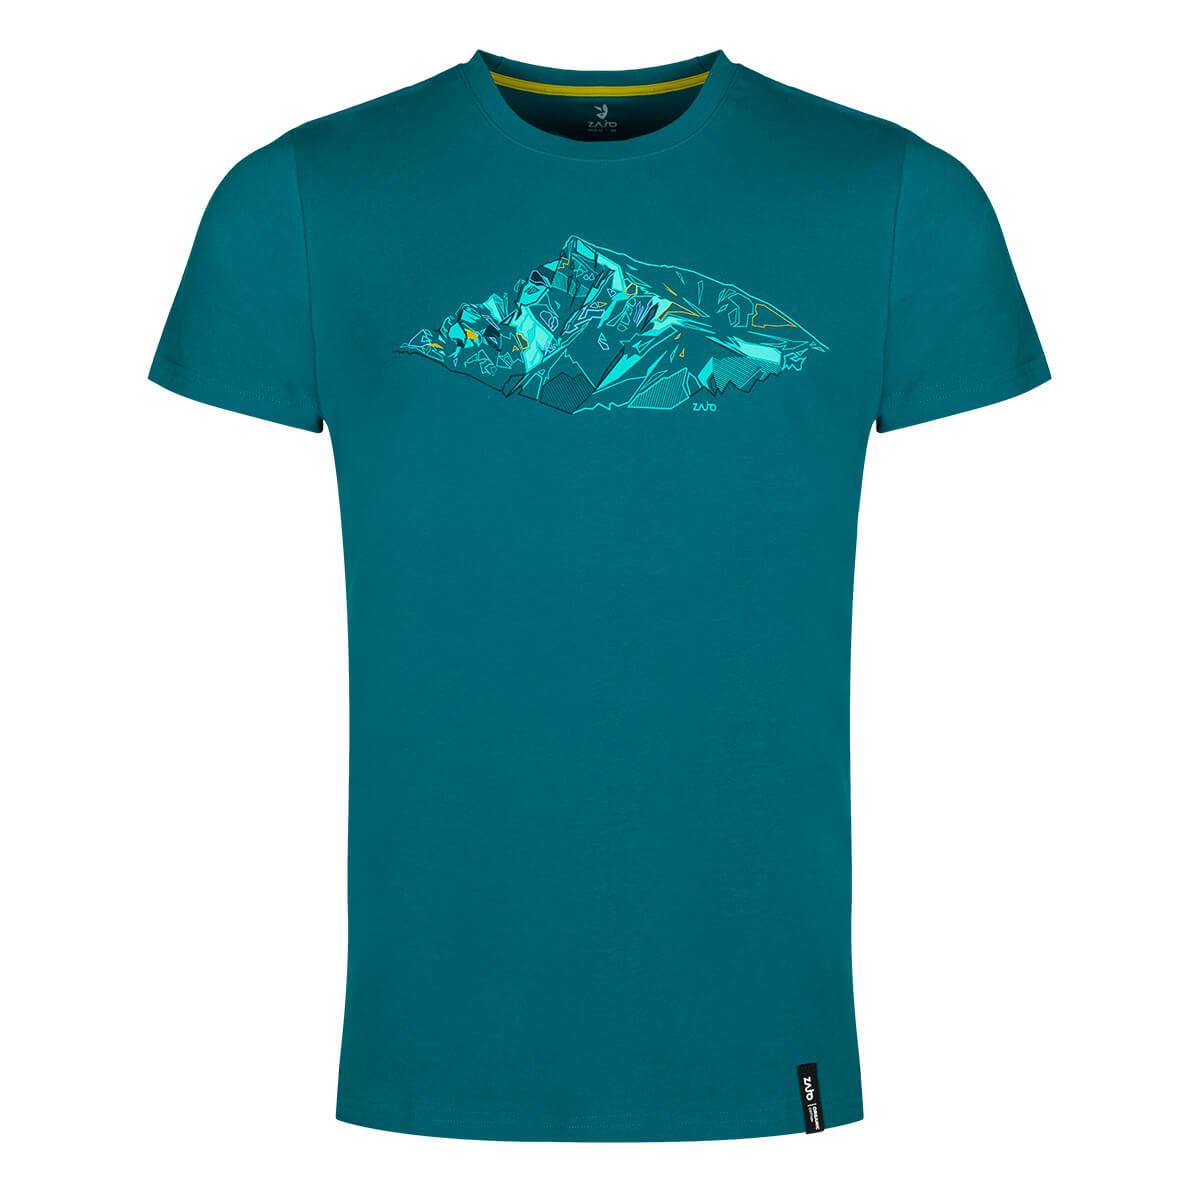 ZAJO Bormio T-Shirt SS pánske tričko Deep Lagoon Peak - veľkosť S